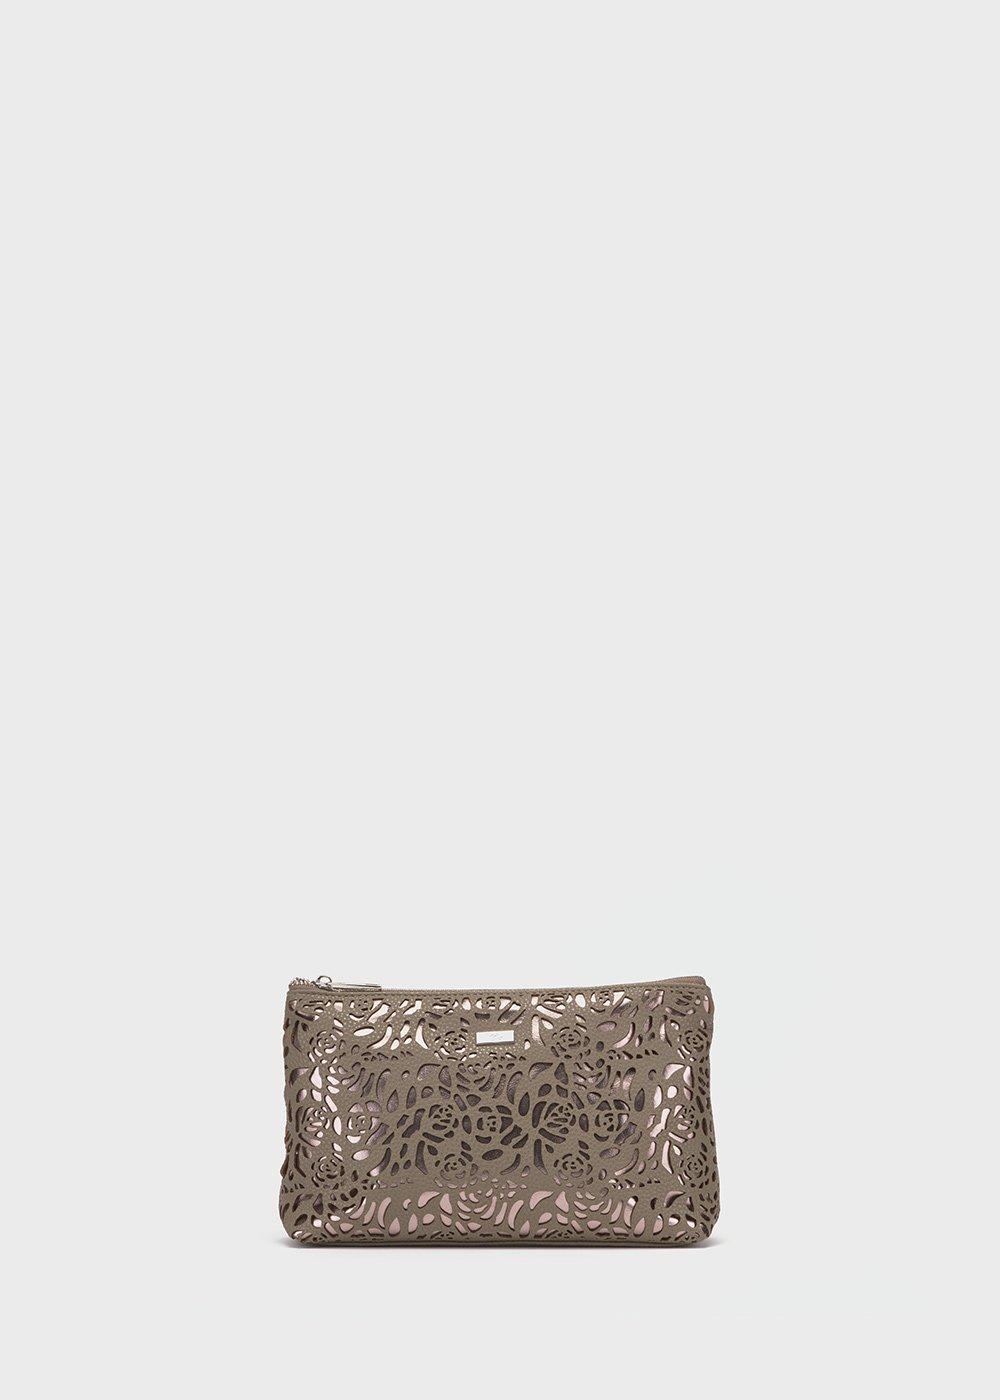 Bloser washbag with openwork roses pattern - Mastice / Gun Metal - Woman